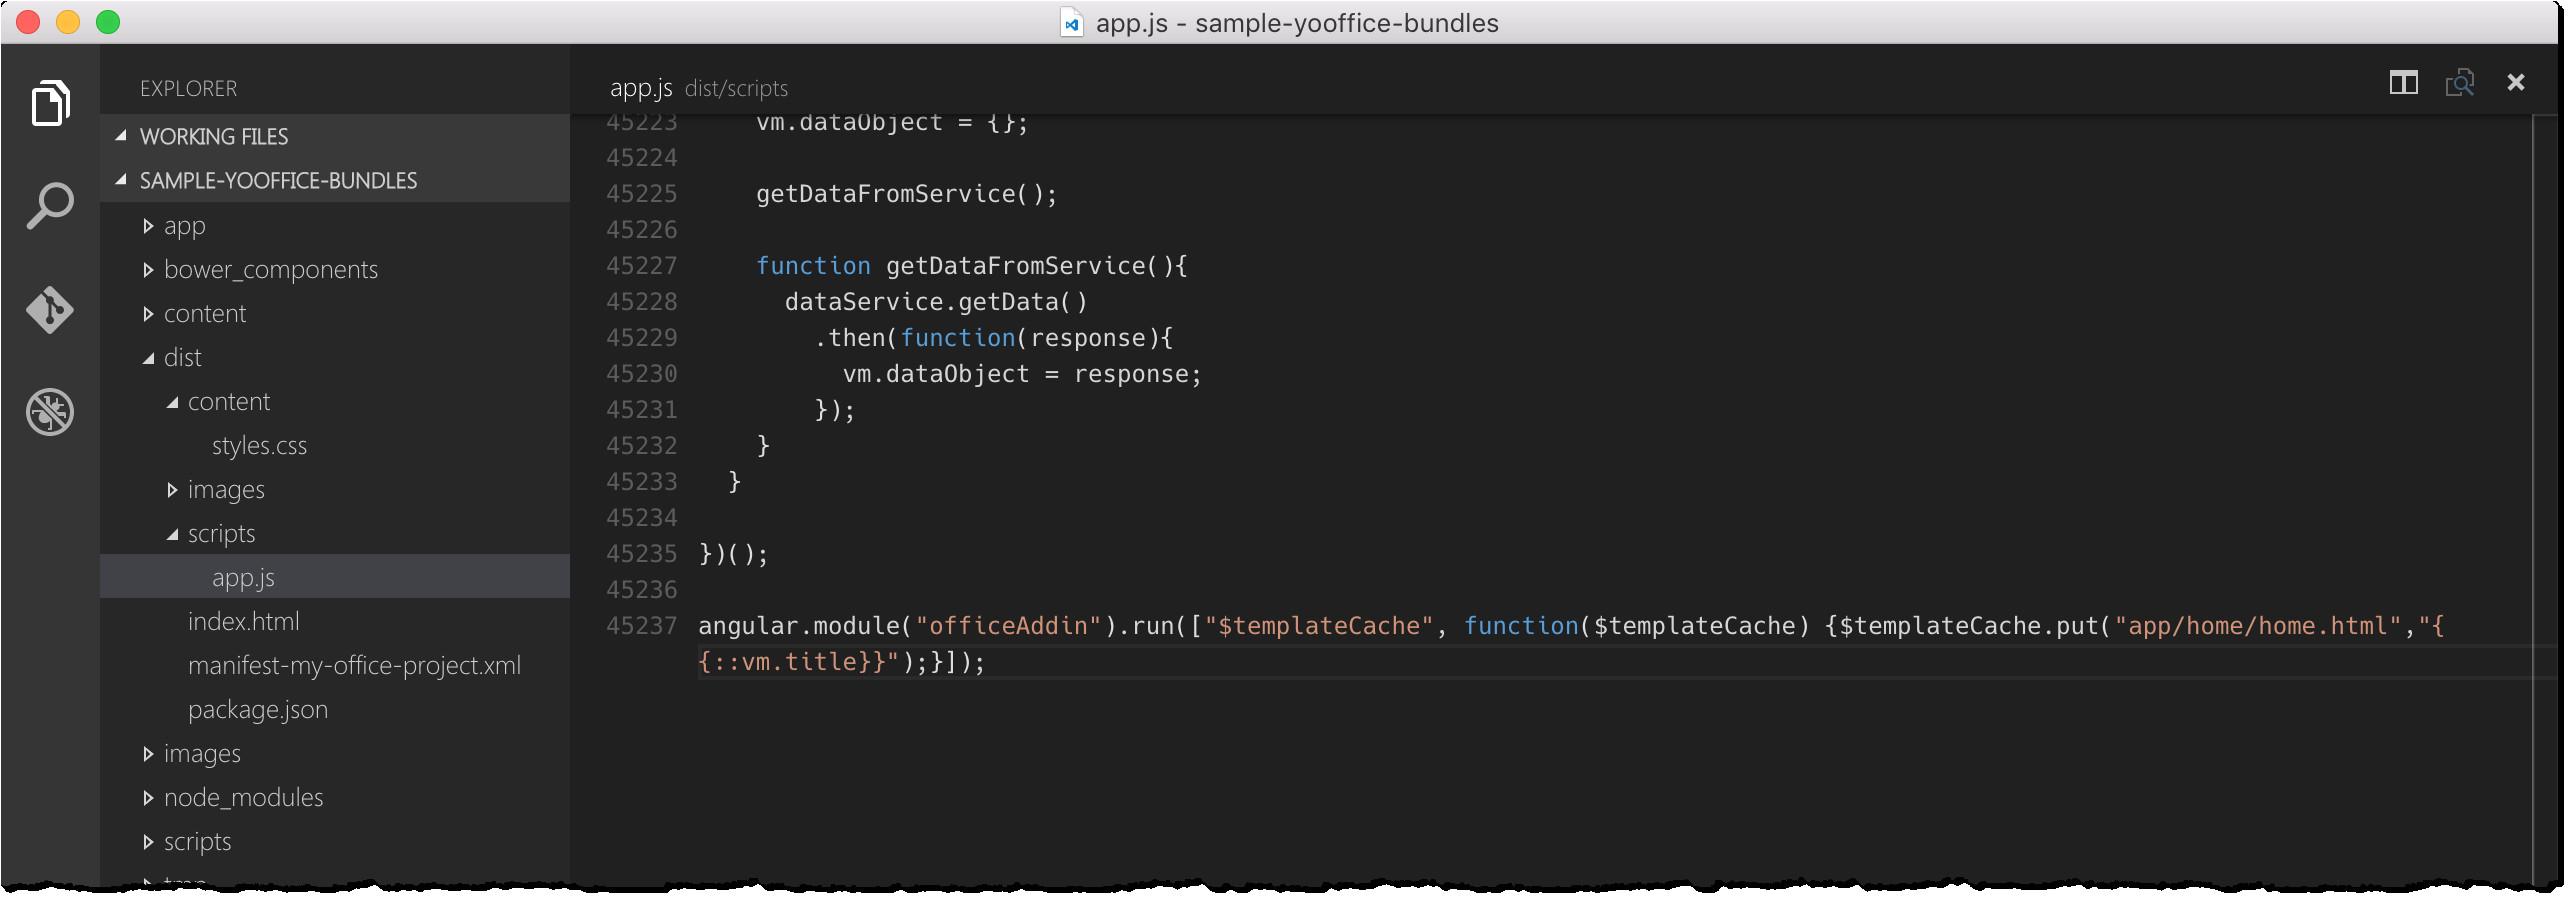 angular template script